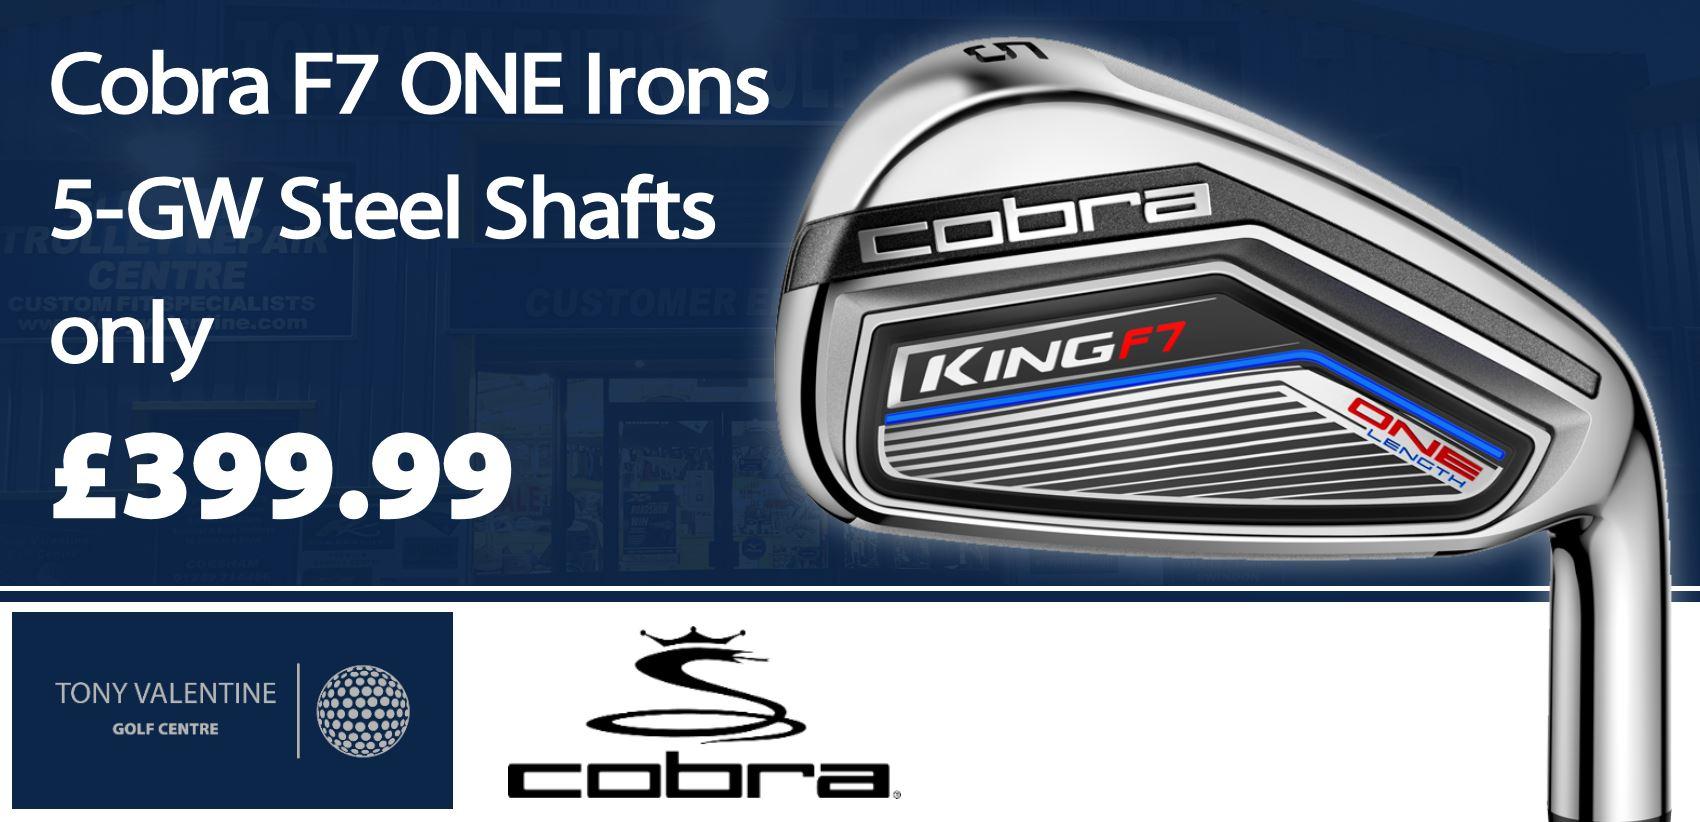 Cobra F7 Irons